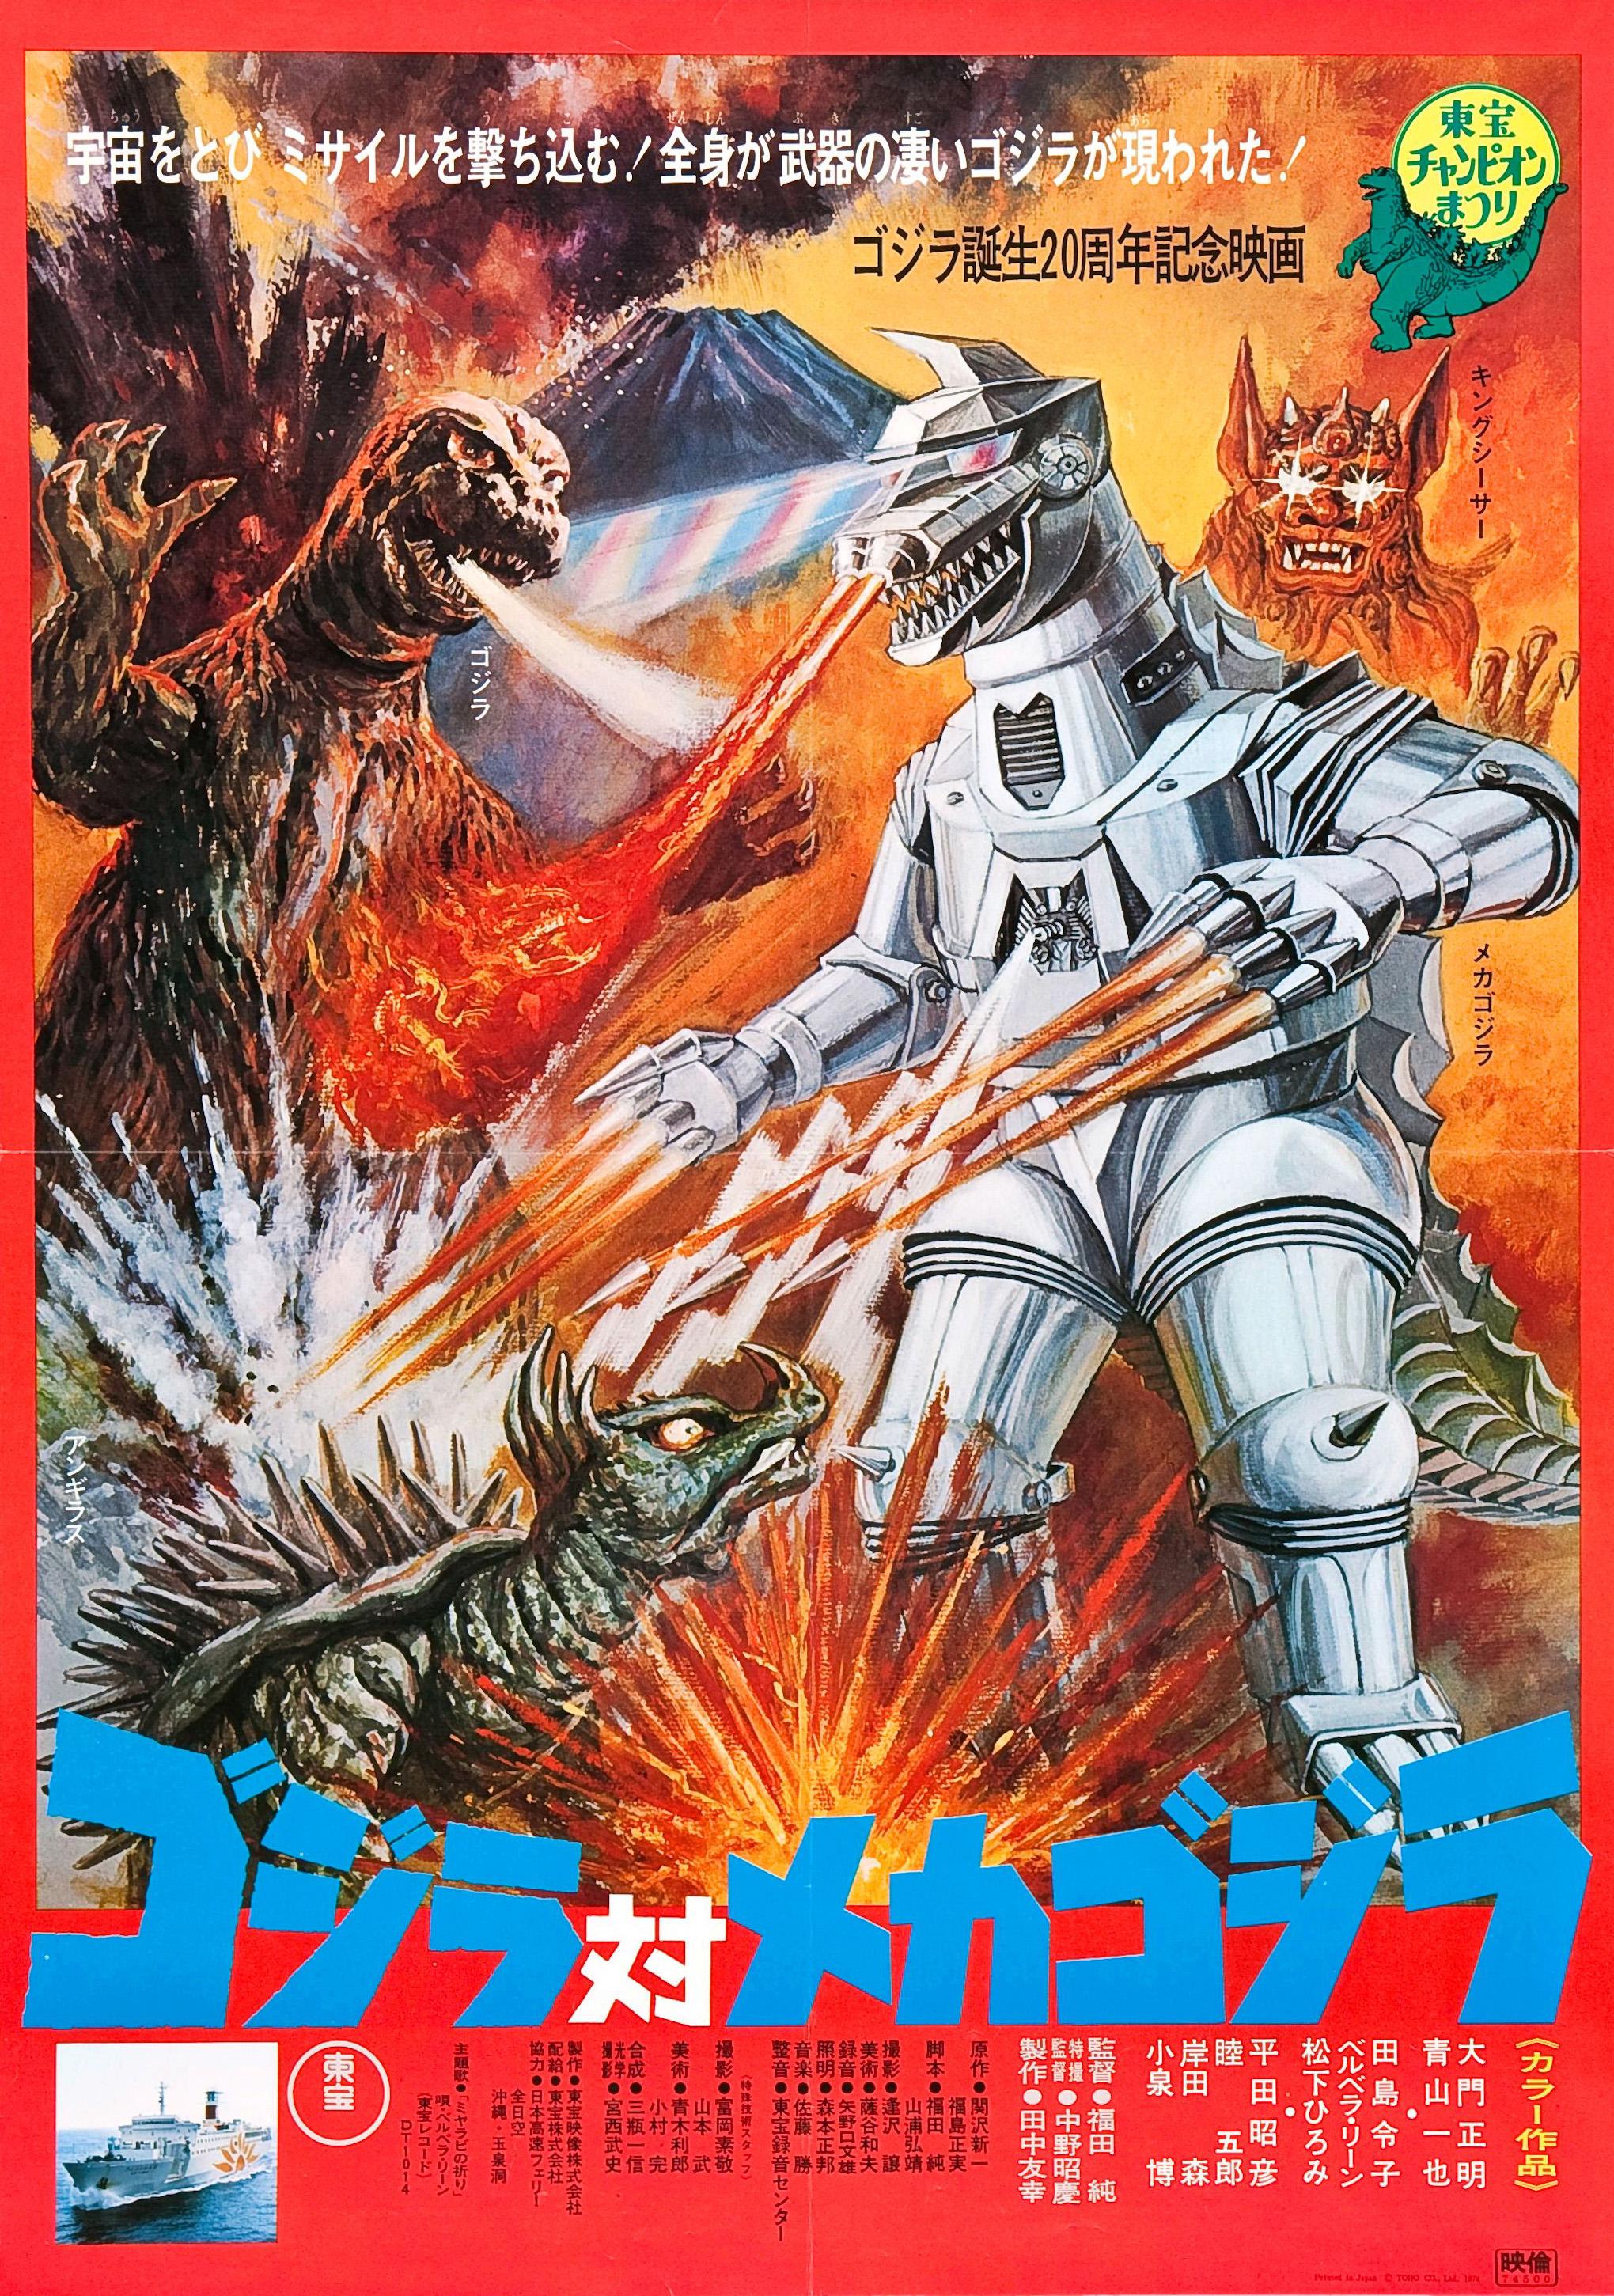 Godzilla vs. Mechagodzilla kapak